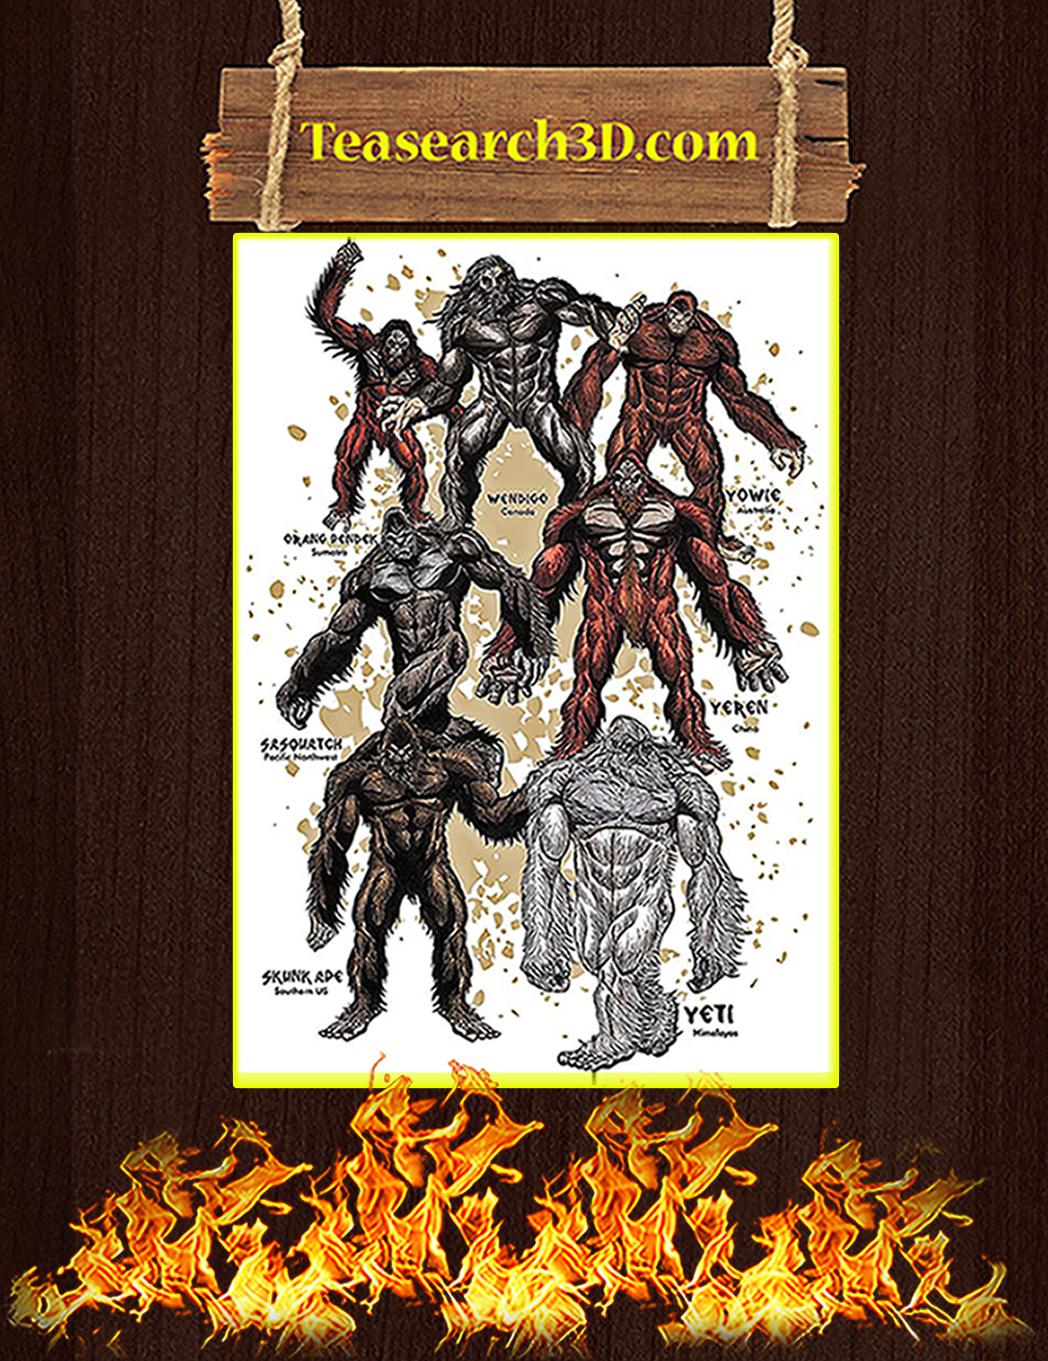 Bigfoot orang pendek wendigo yowie poster A1